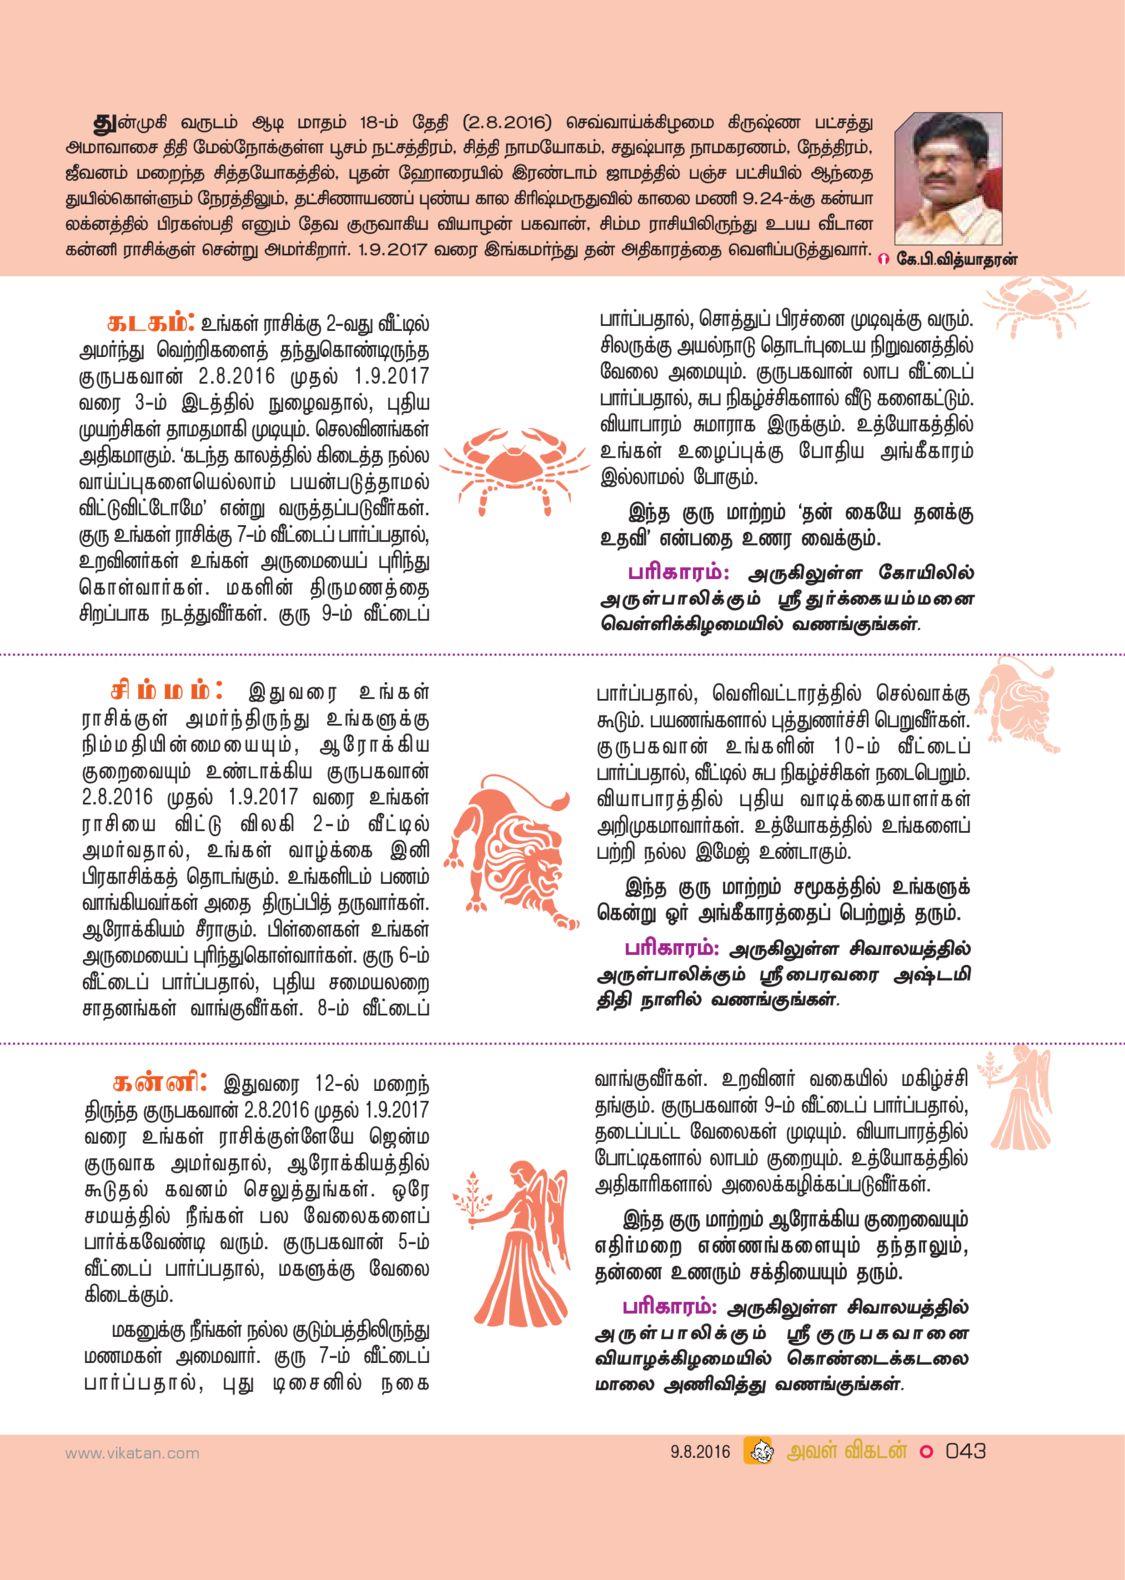 2016 Gurupeyarchi Palan and Pariharam from Aval Vikatan Tamilmagazine